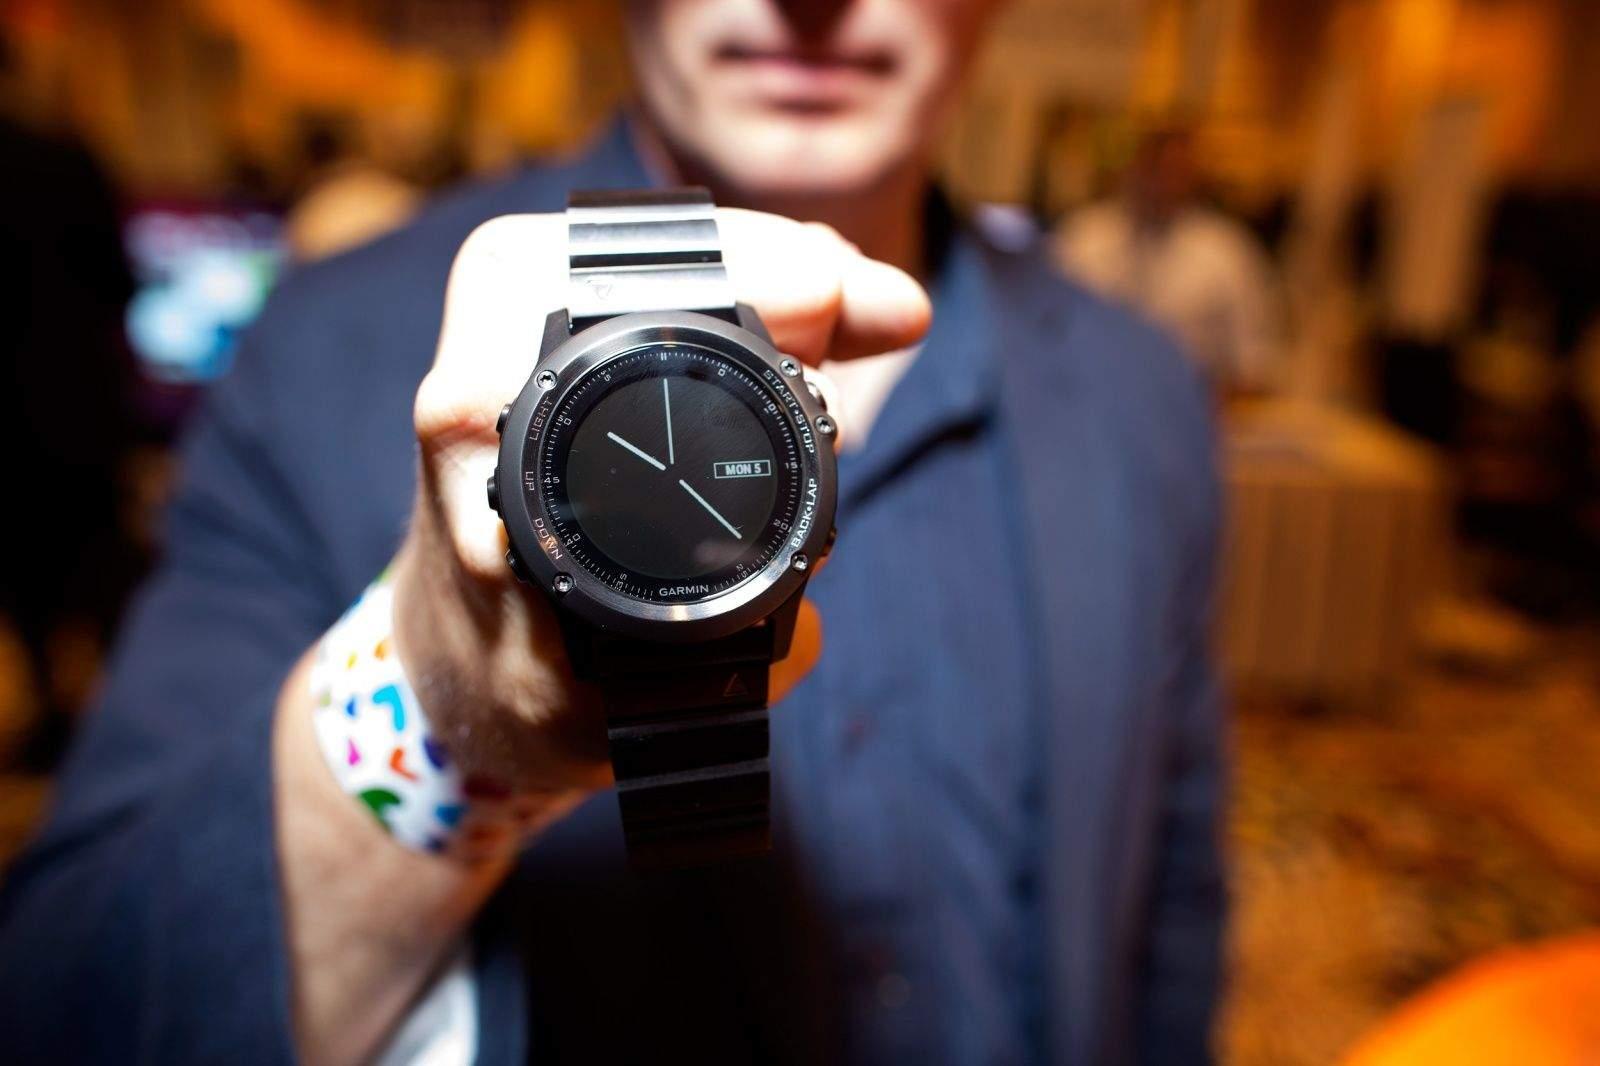 Garmin watch. Photo: Jim Merithew/Cult of Mac